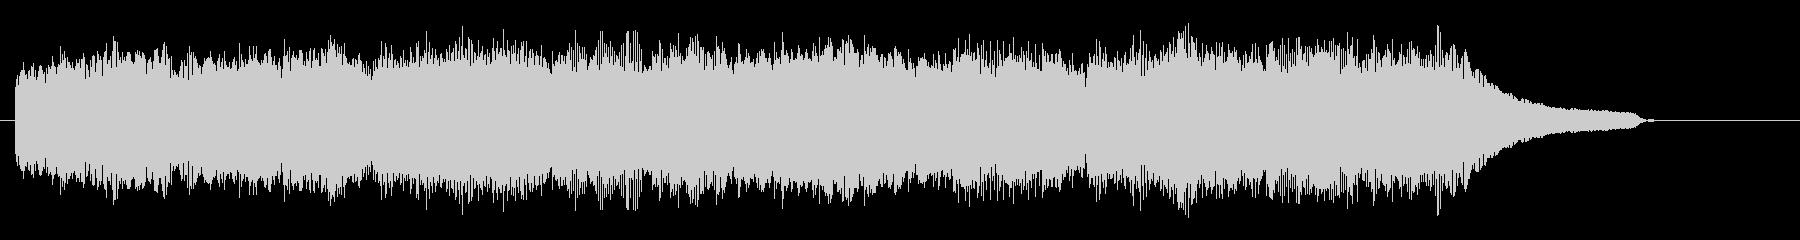 CM30秒/優しく感動的なピアノソロ22の未再生の波形